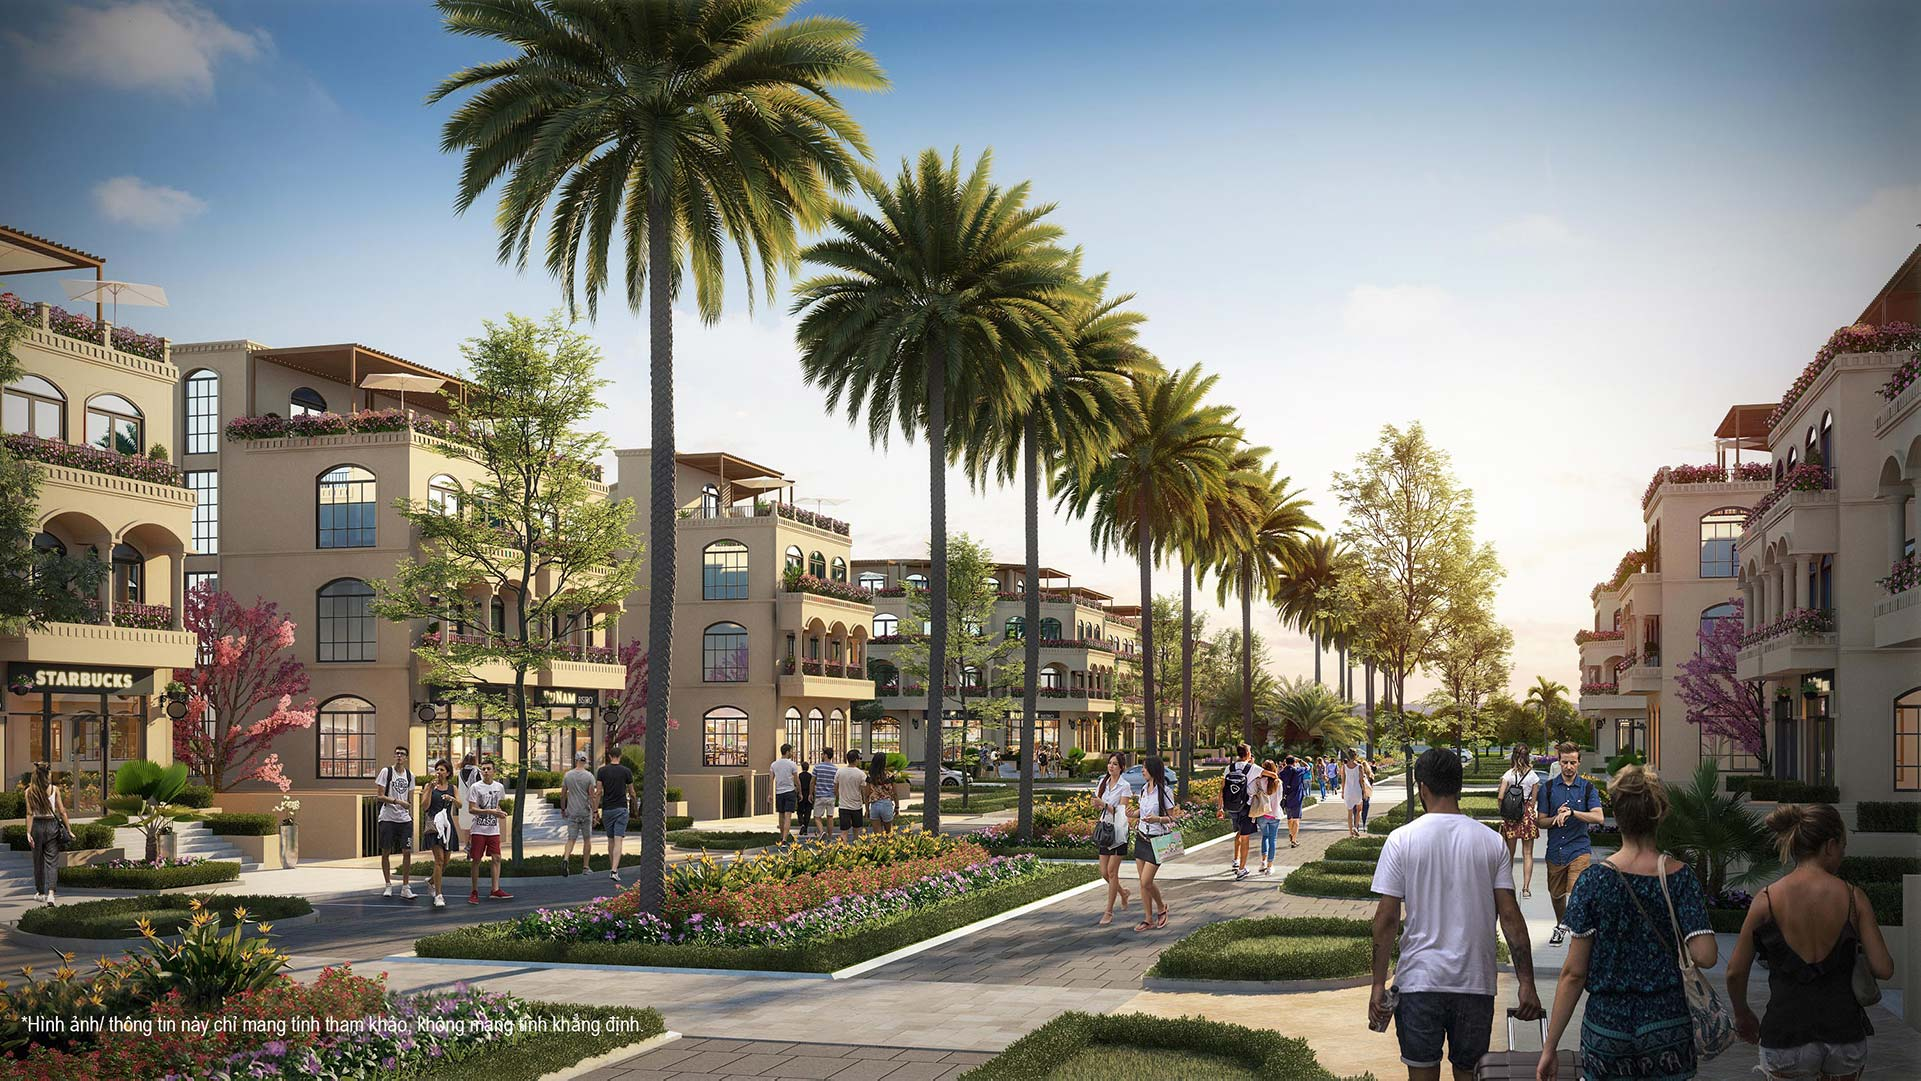 Palm Garden Shop Villas - Phoi canh noi khu